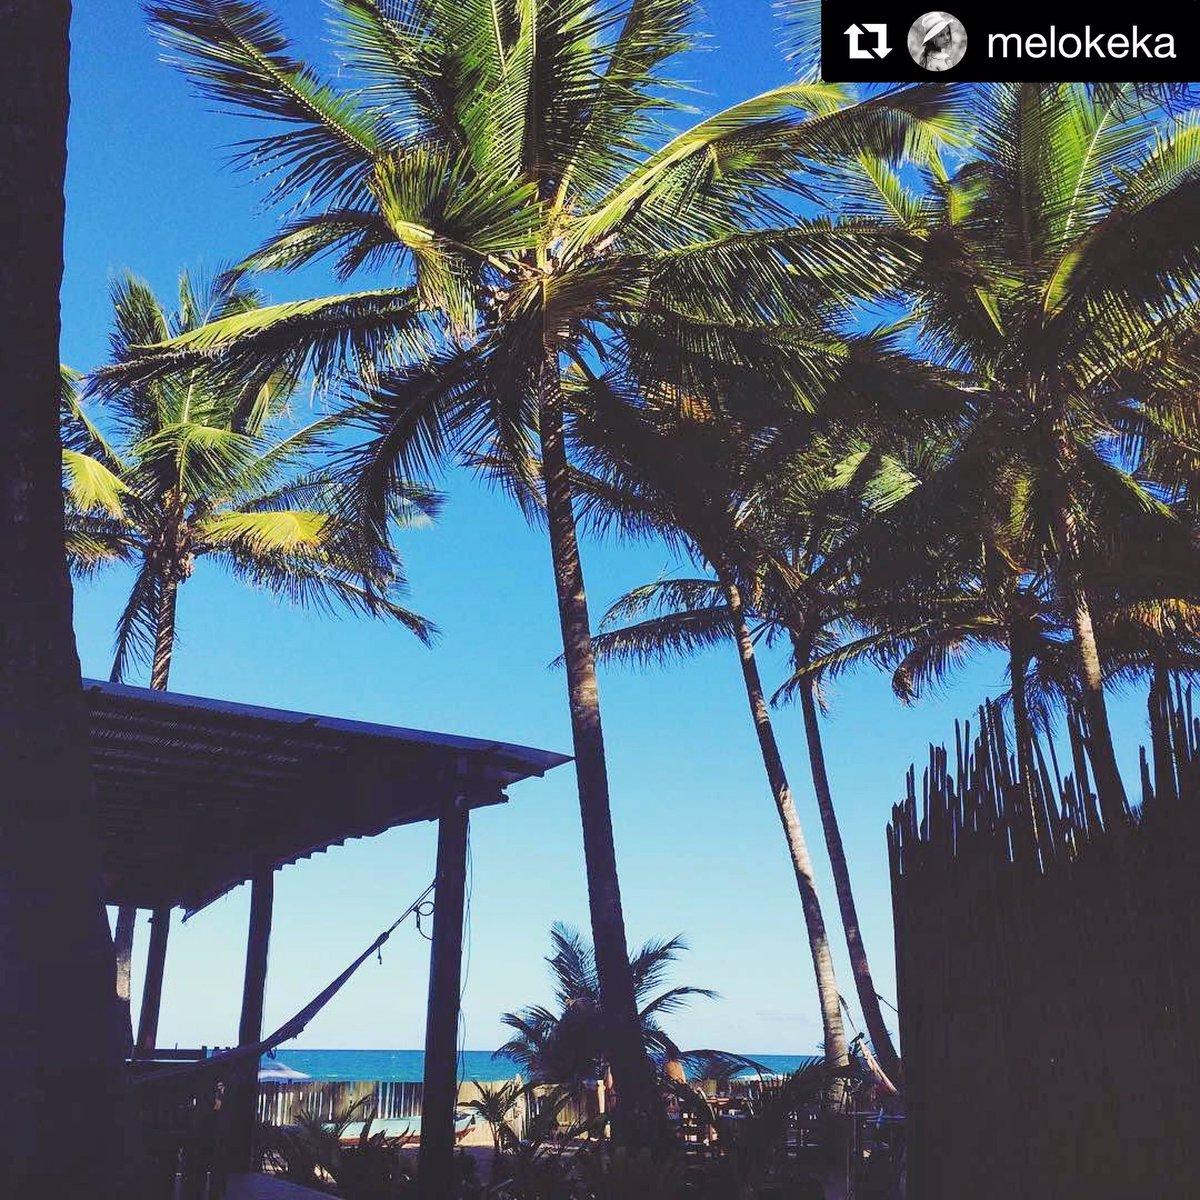 #Repost @melokeka (@get_repost) ・・・   Beautiful day in paradise!  #inverno #sqn #diaDeSol #paraiso #vemPraDreamland<br>http://pic.twitter.com/6uUkCpY3ls